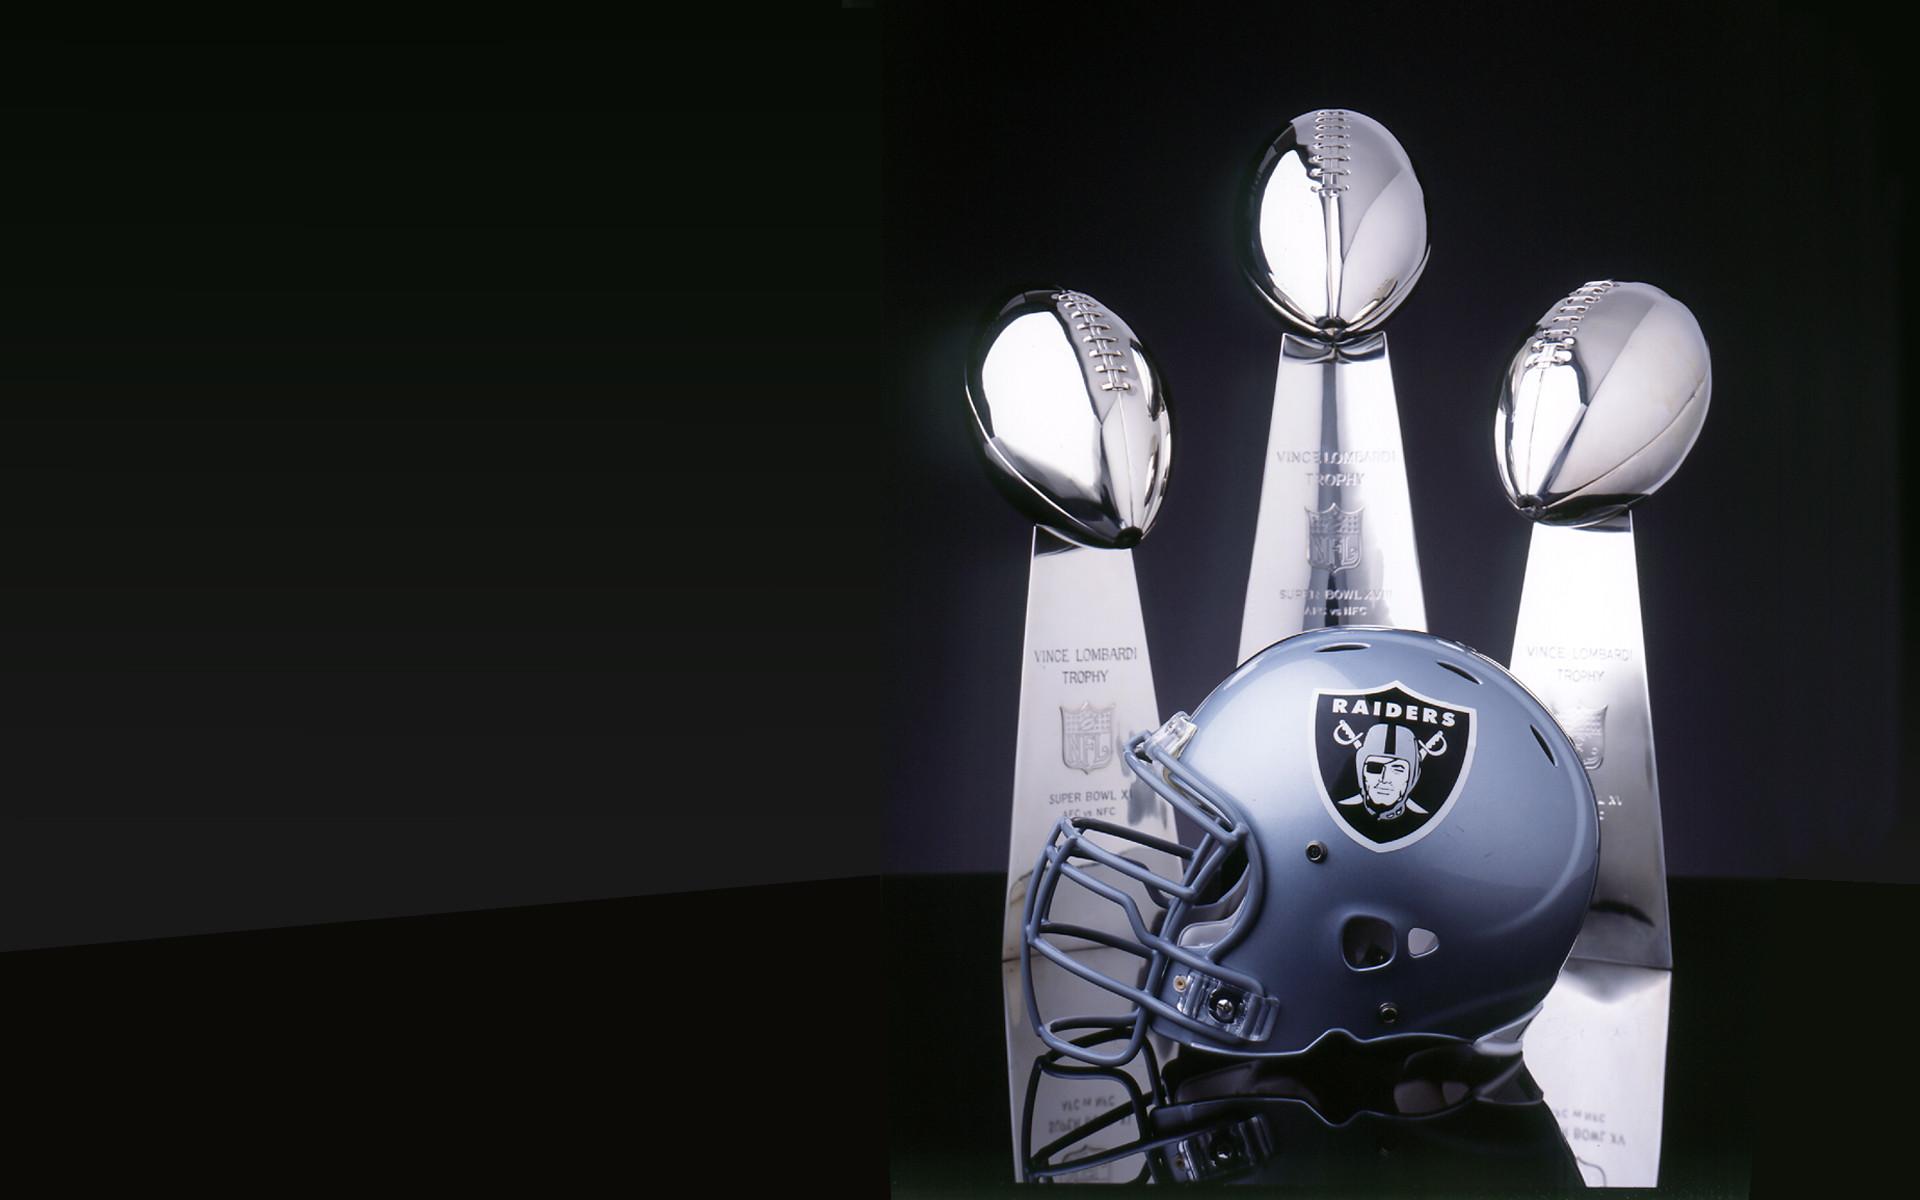 Oakland Raiders Wallpaper And Screensavers 71 Images